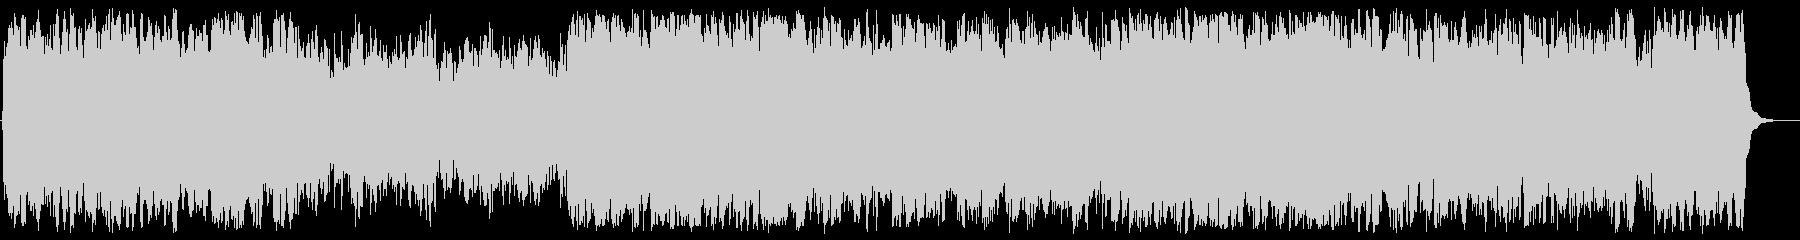 Fantastic and sacred spiritual sound's unreproduced waveform